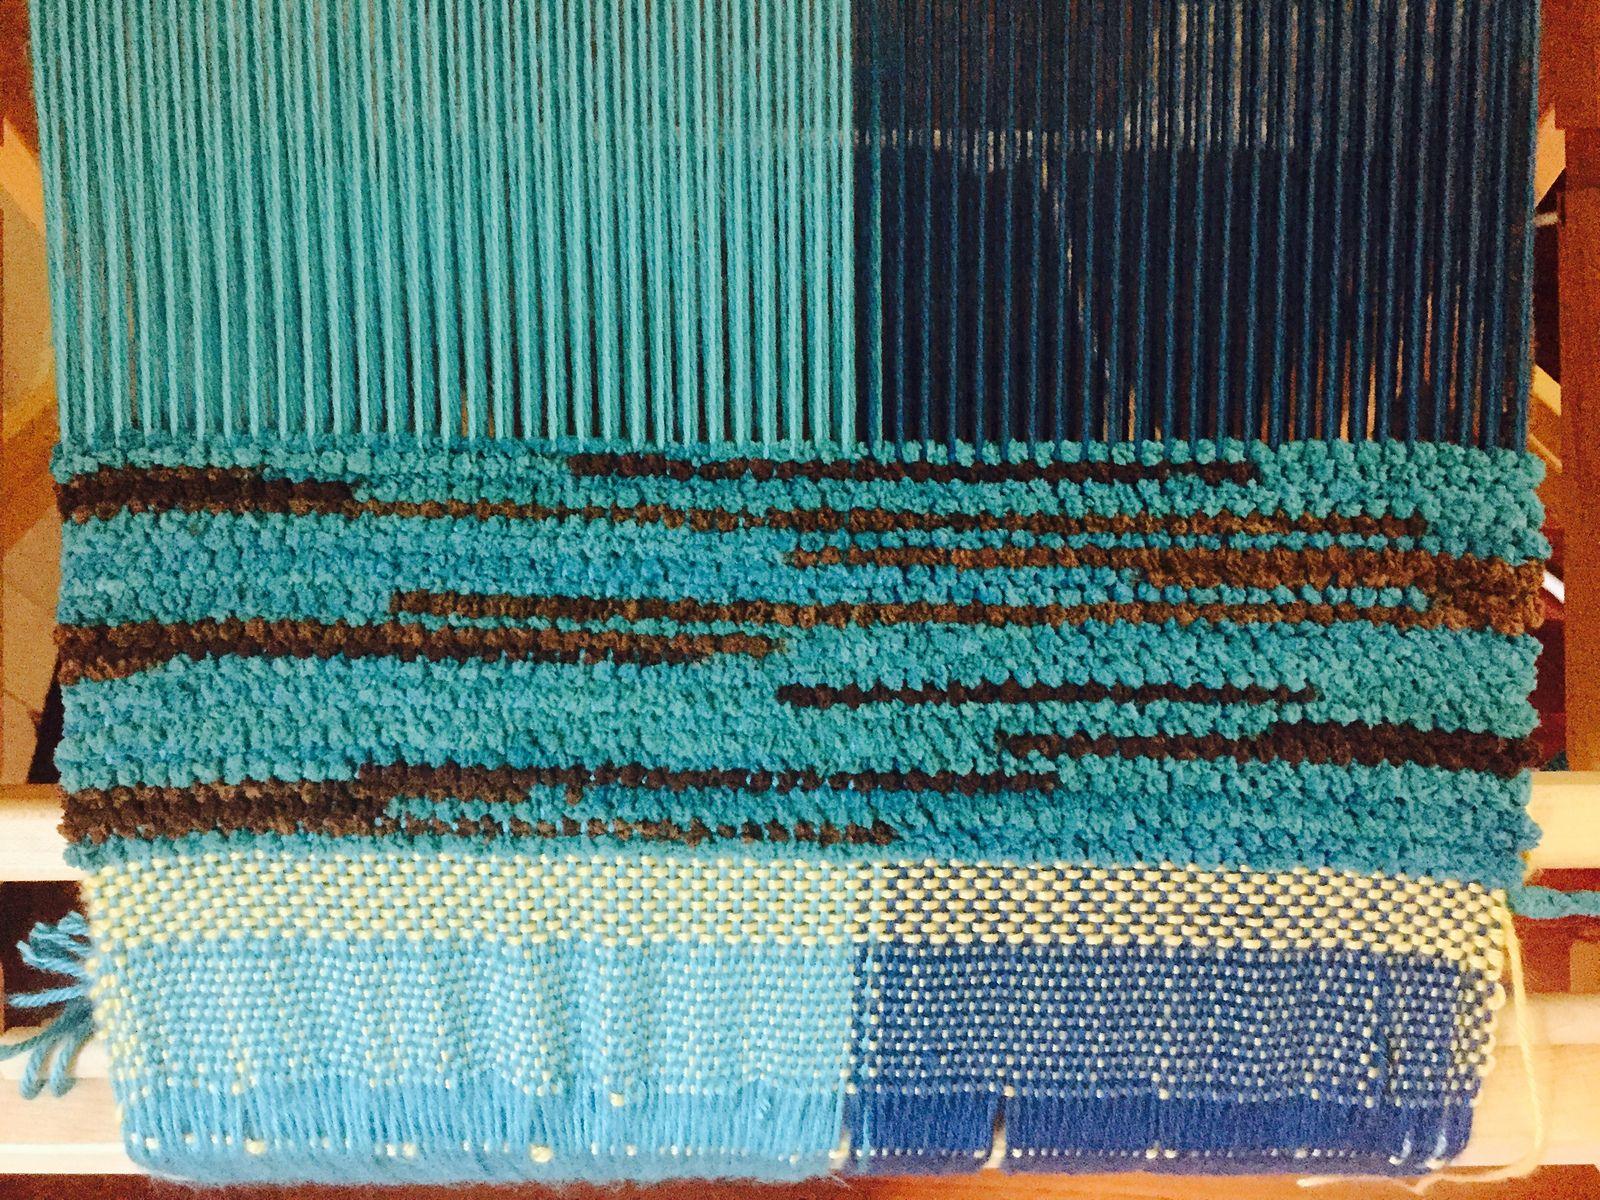 Cricket Loom Cricket Loom Tapestry Loom Rigid Heddle Weaving Patterns